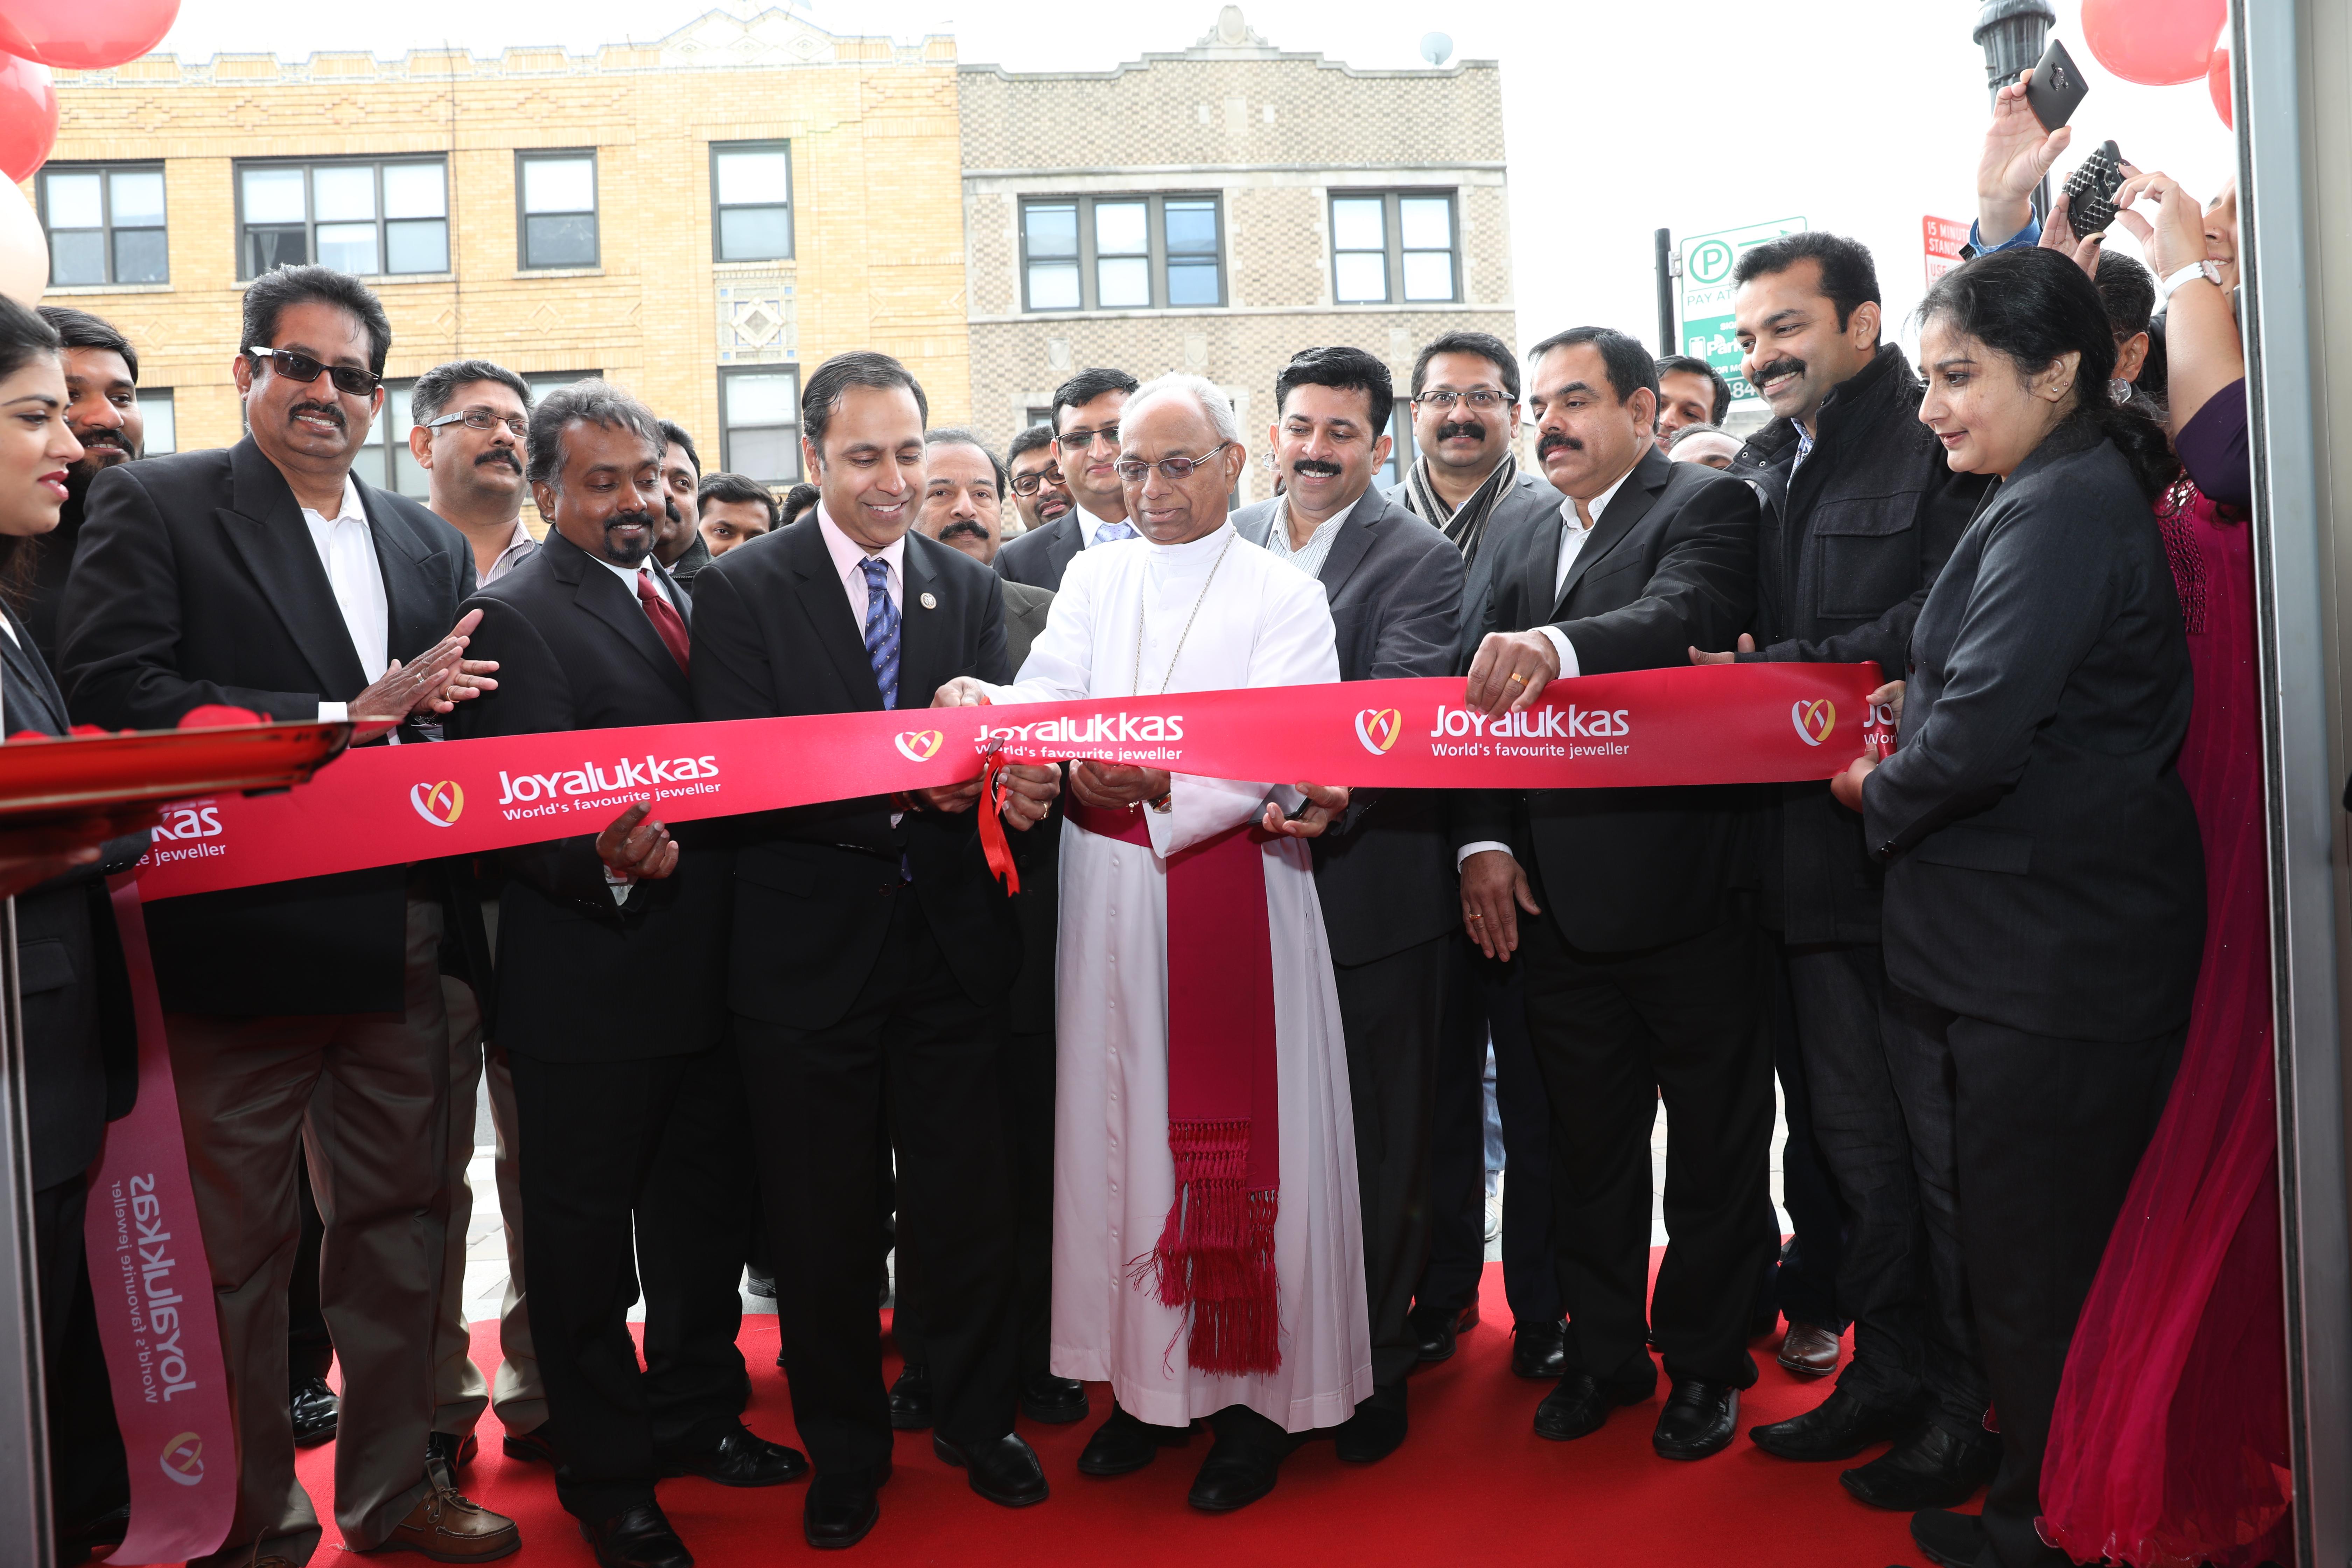 Joyalukkas opened 3rd Showroom in USA at Chicago ILA Times